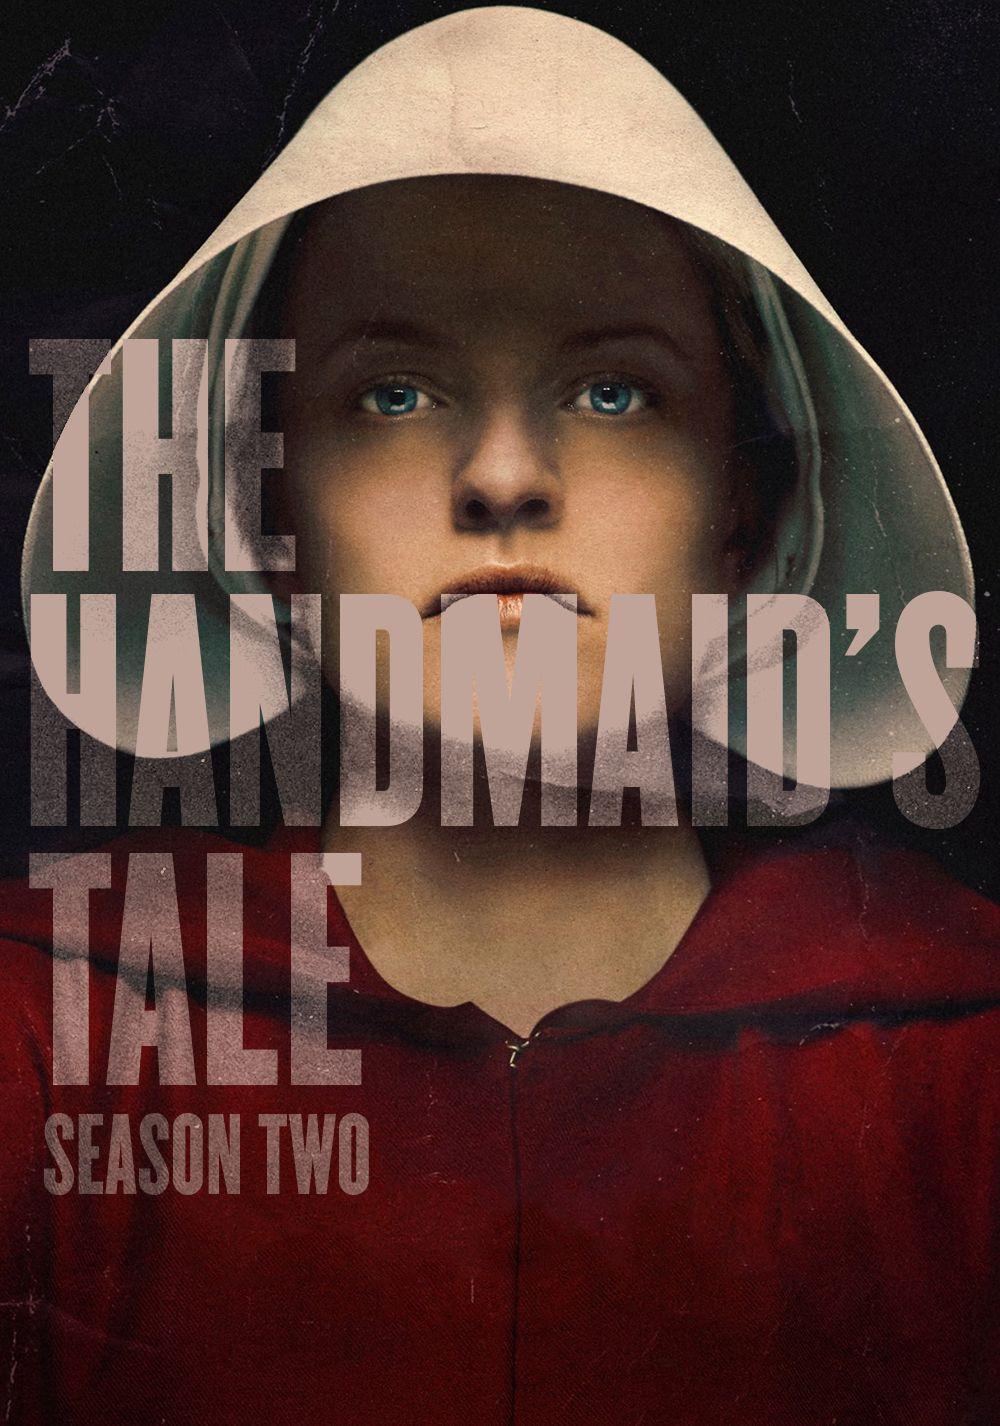 The Handmaid's Tale Season 2 Streaming : handmaid's, season, streaming, Watch, Handmaid's, Season, Online, 123Movies., Seasons,, Tales,